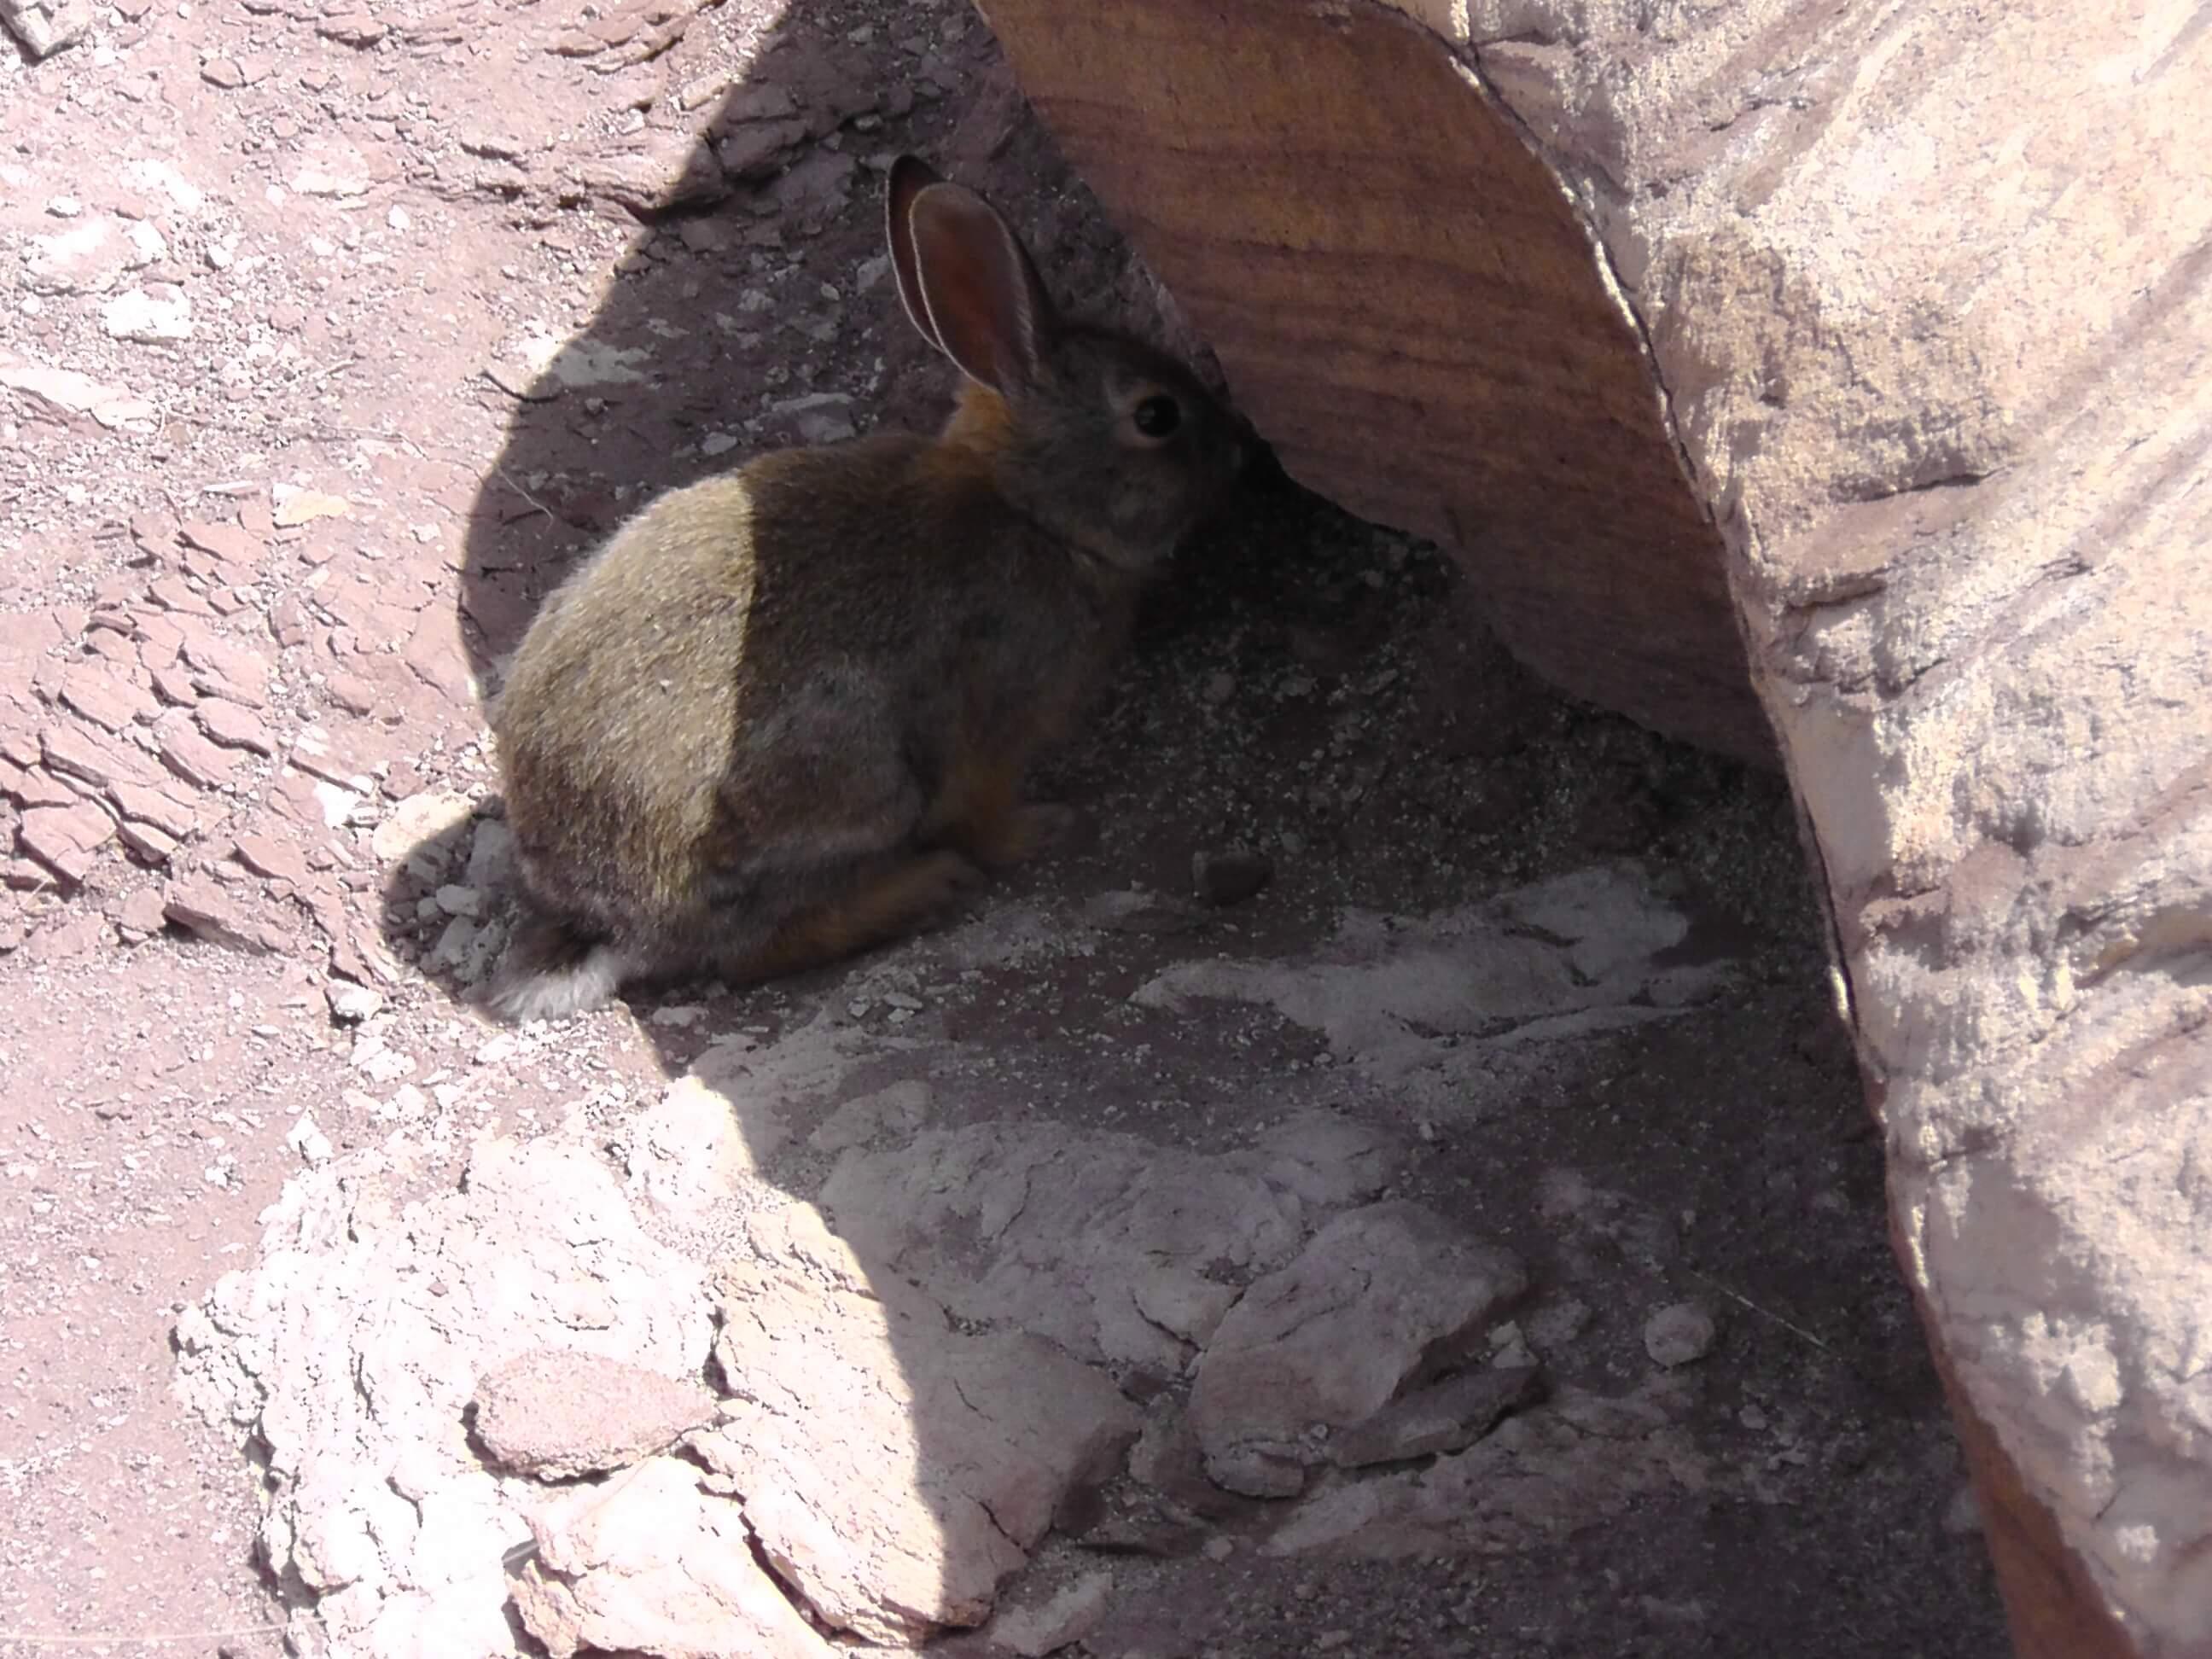 Rabbit - Petrified Forest National Park, AZ